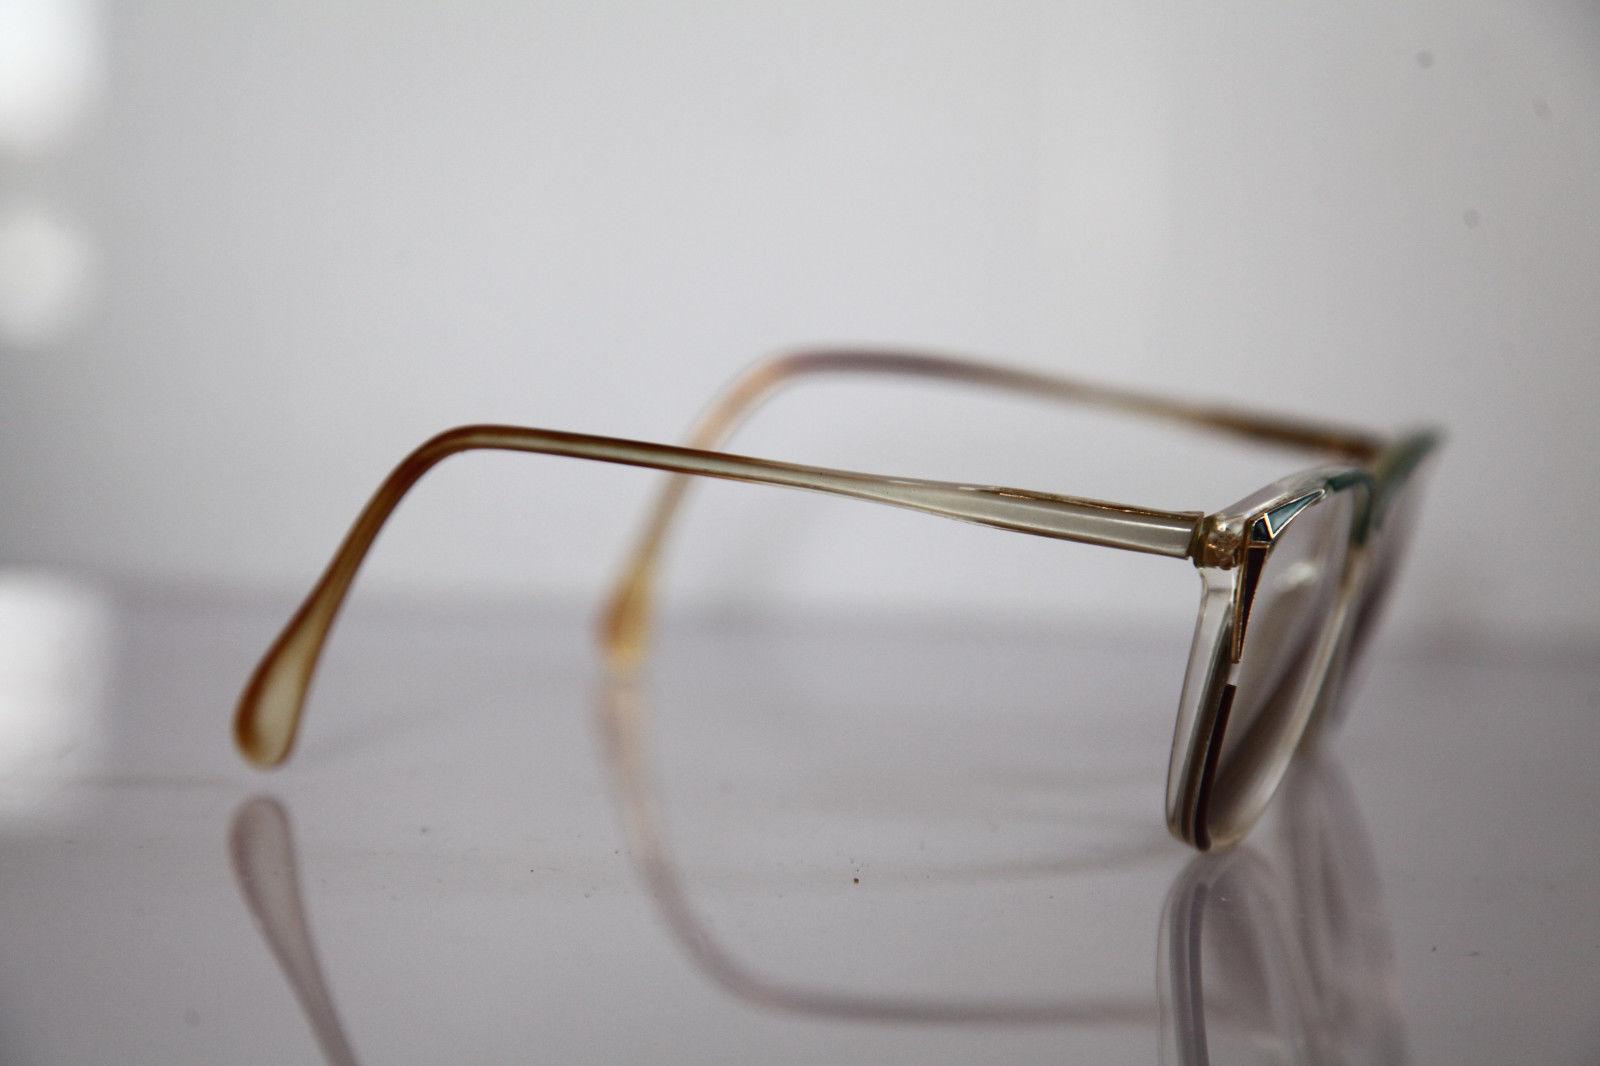 OWP Eyewear, Crystal Multi-color Frame,  RX-Able Clear Prescription lenses.